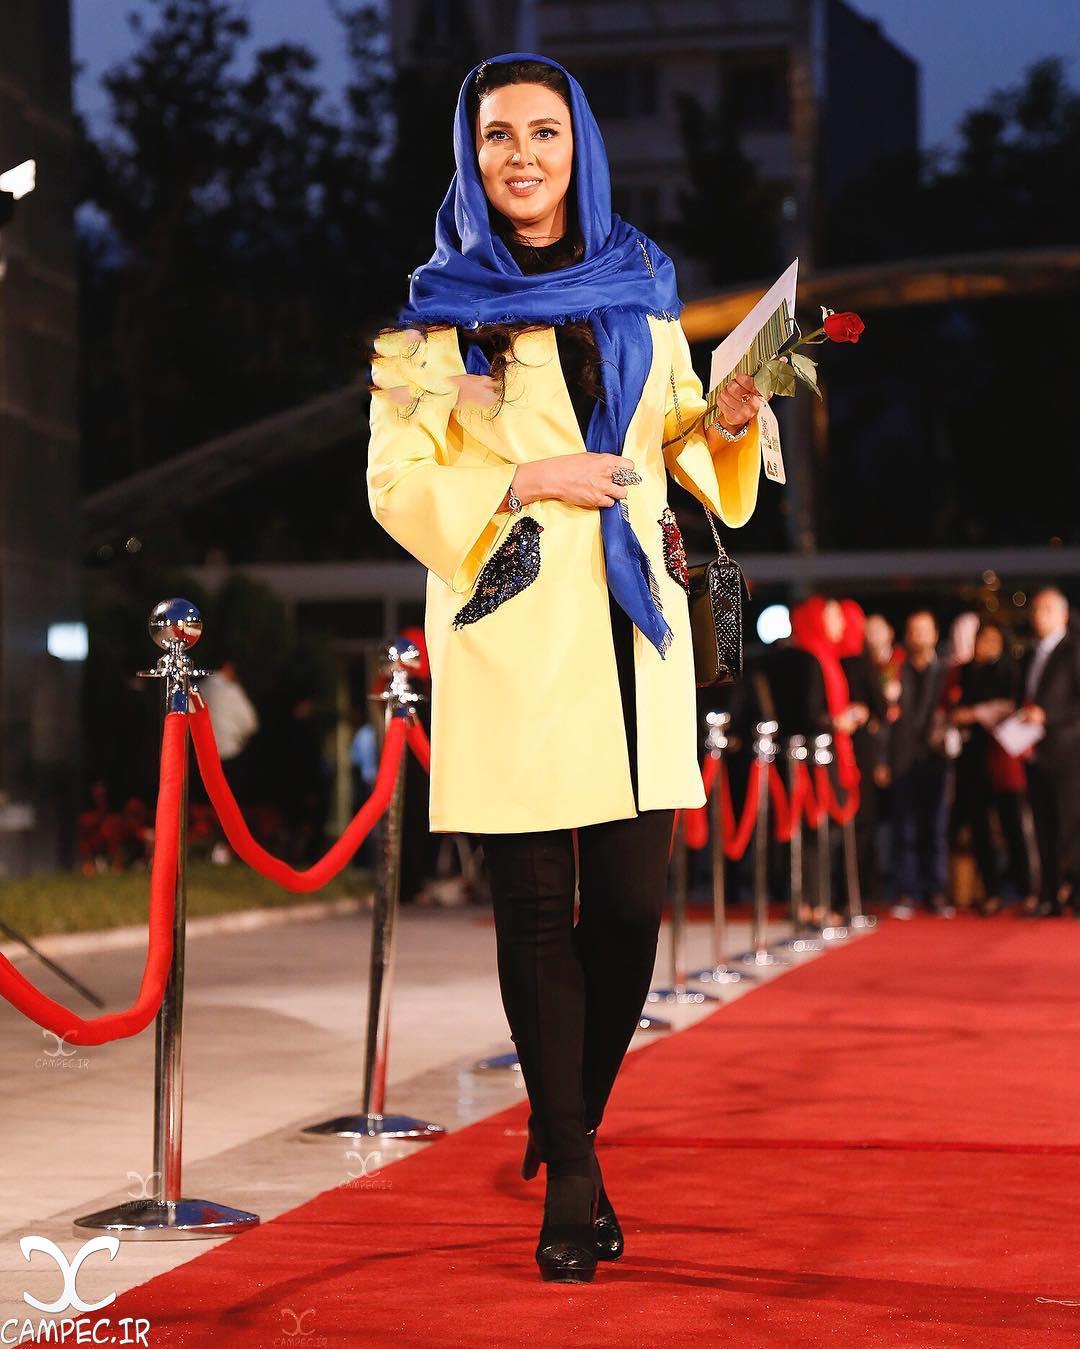 لیلا بلوکات در جشن حافظ